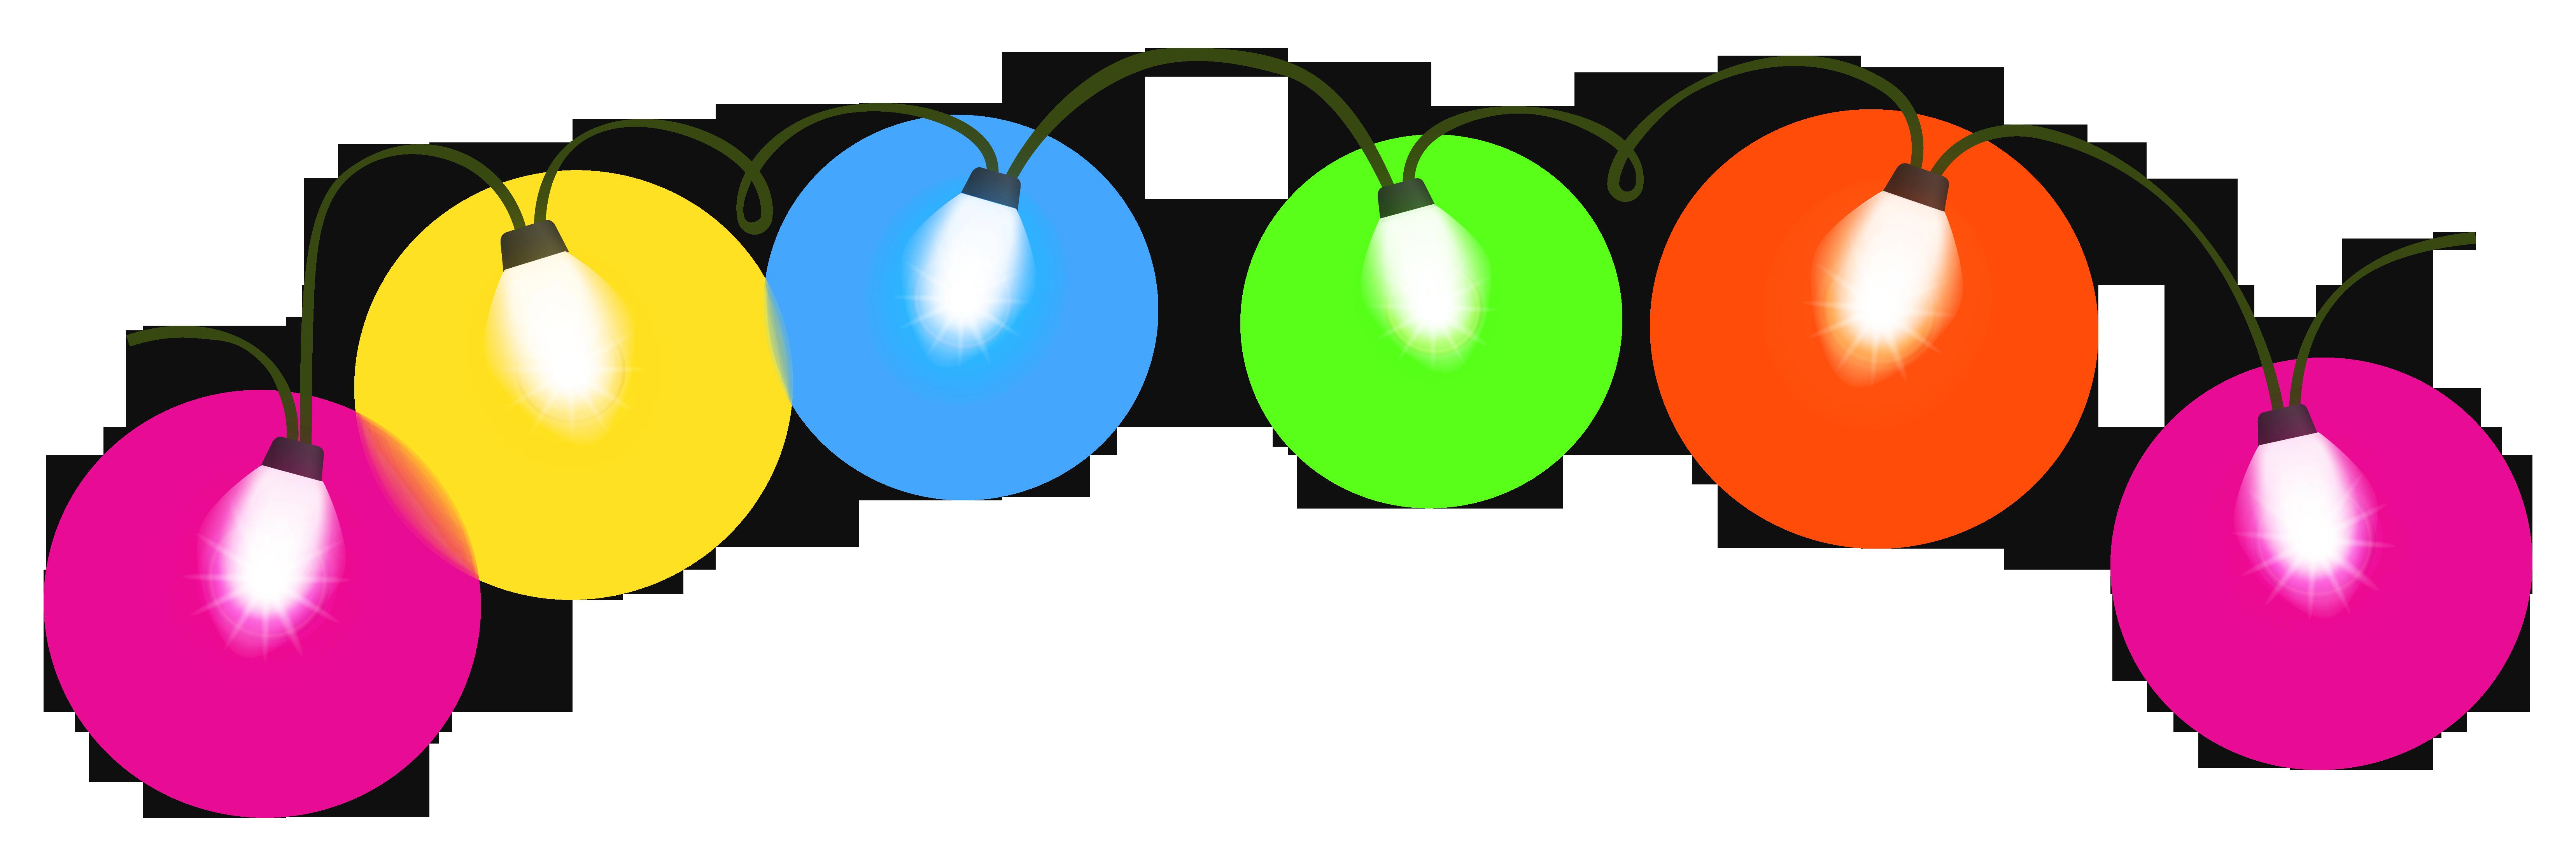 Transparent christmas lights clipart 2-Transparent christmas lights clipart 2-12